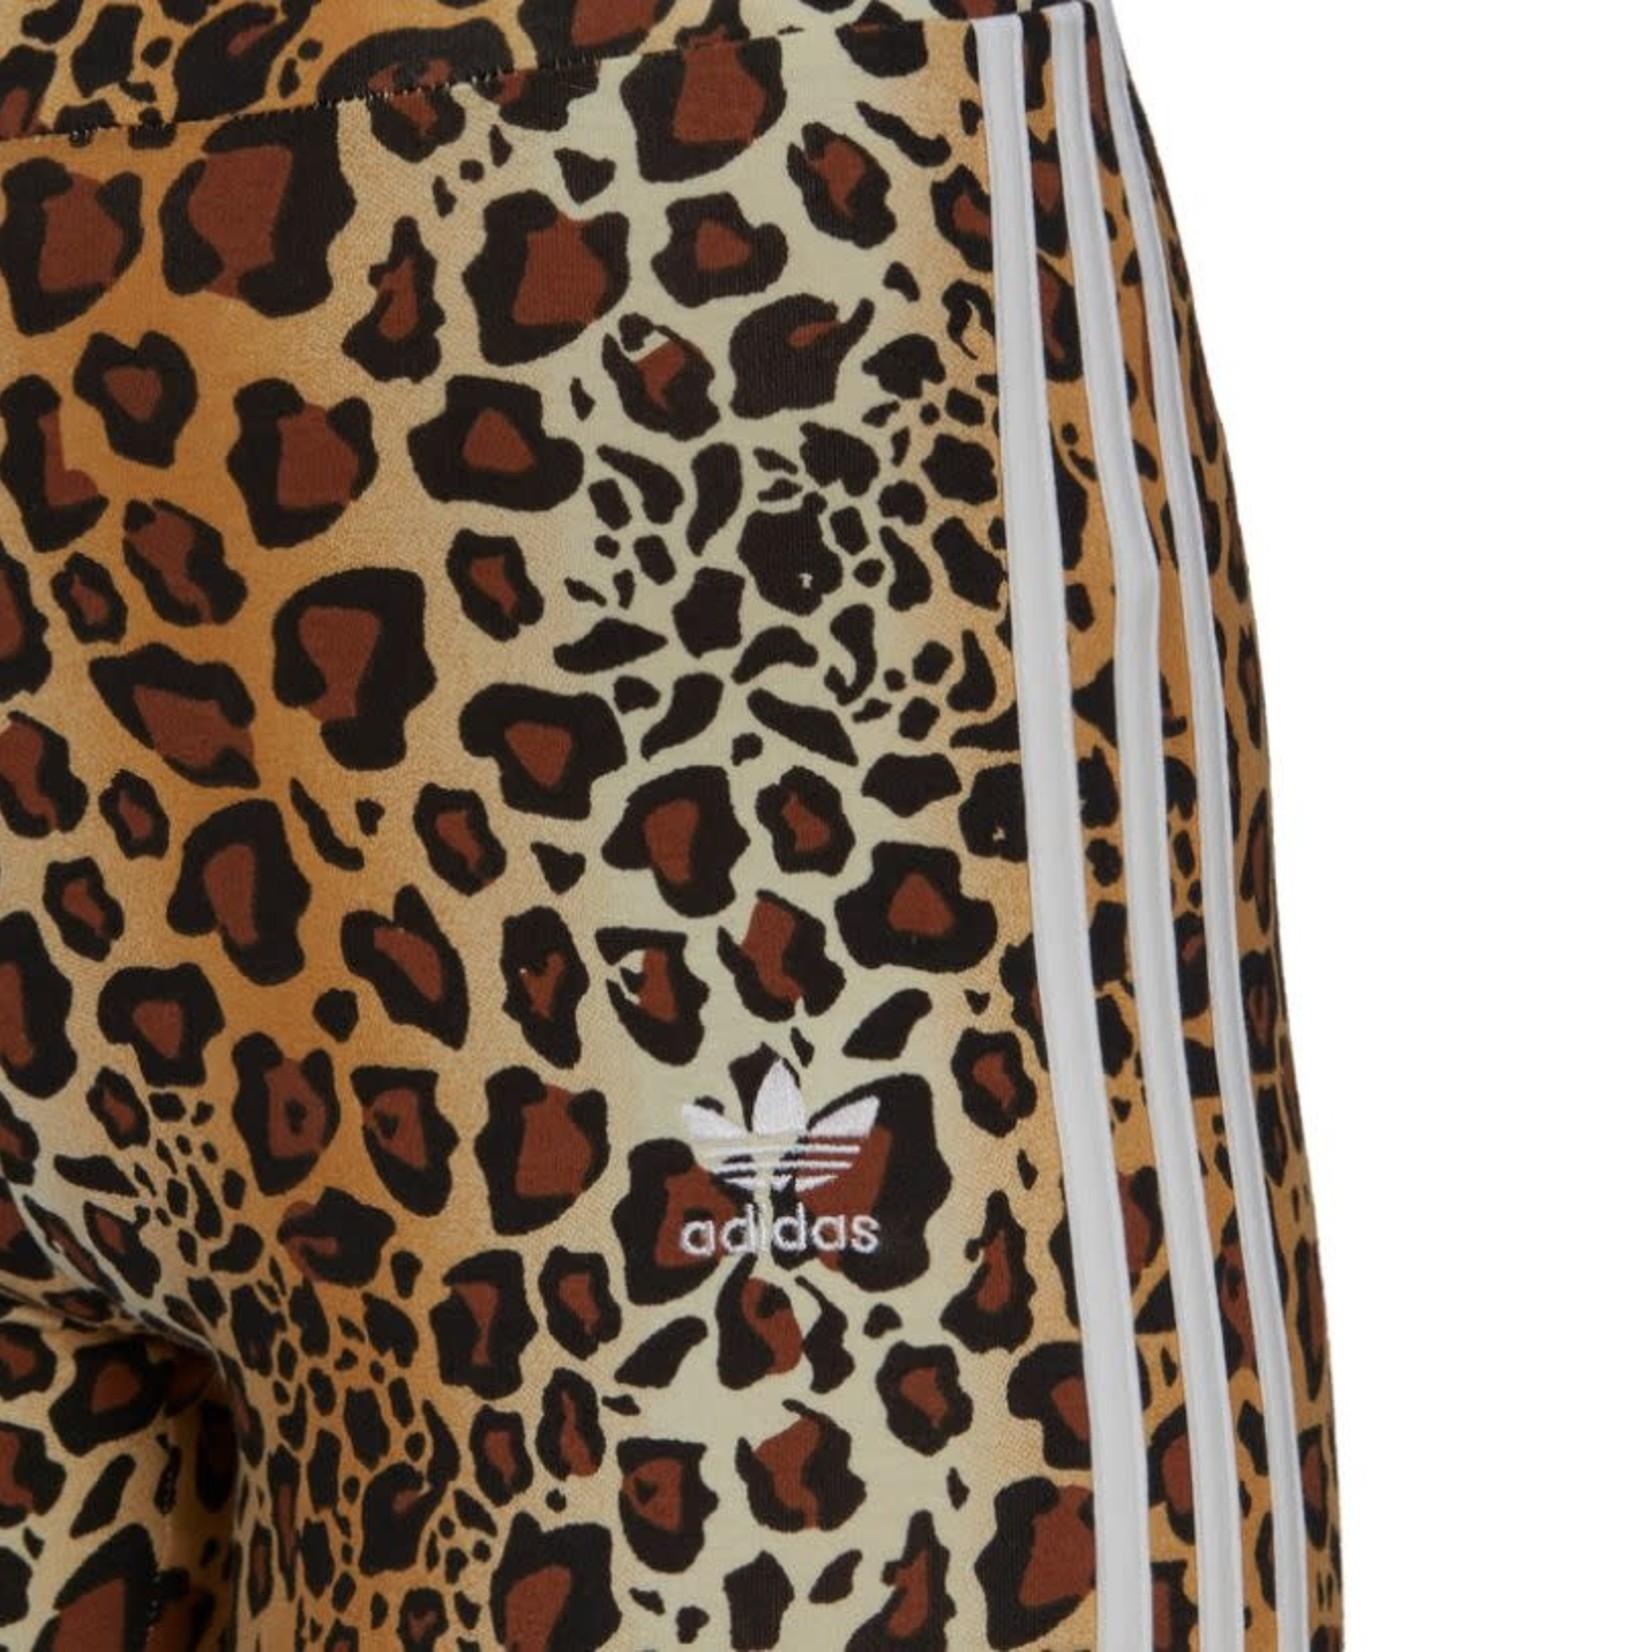 Adidas Adidas : Leopard Biker Short